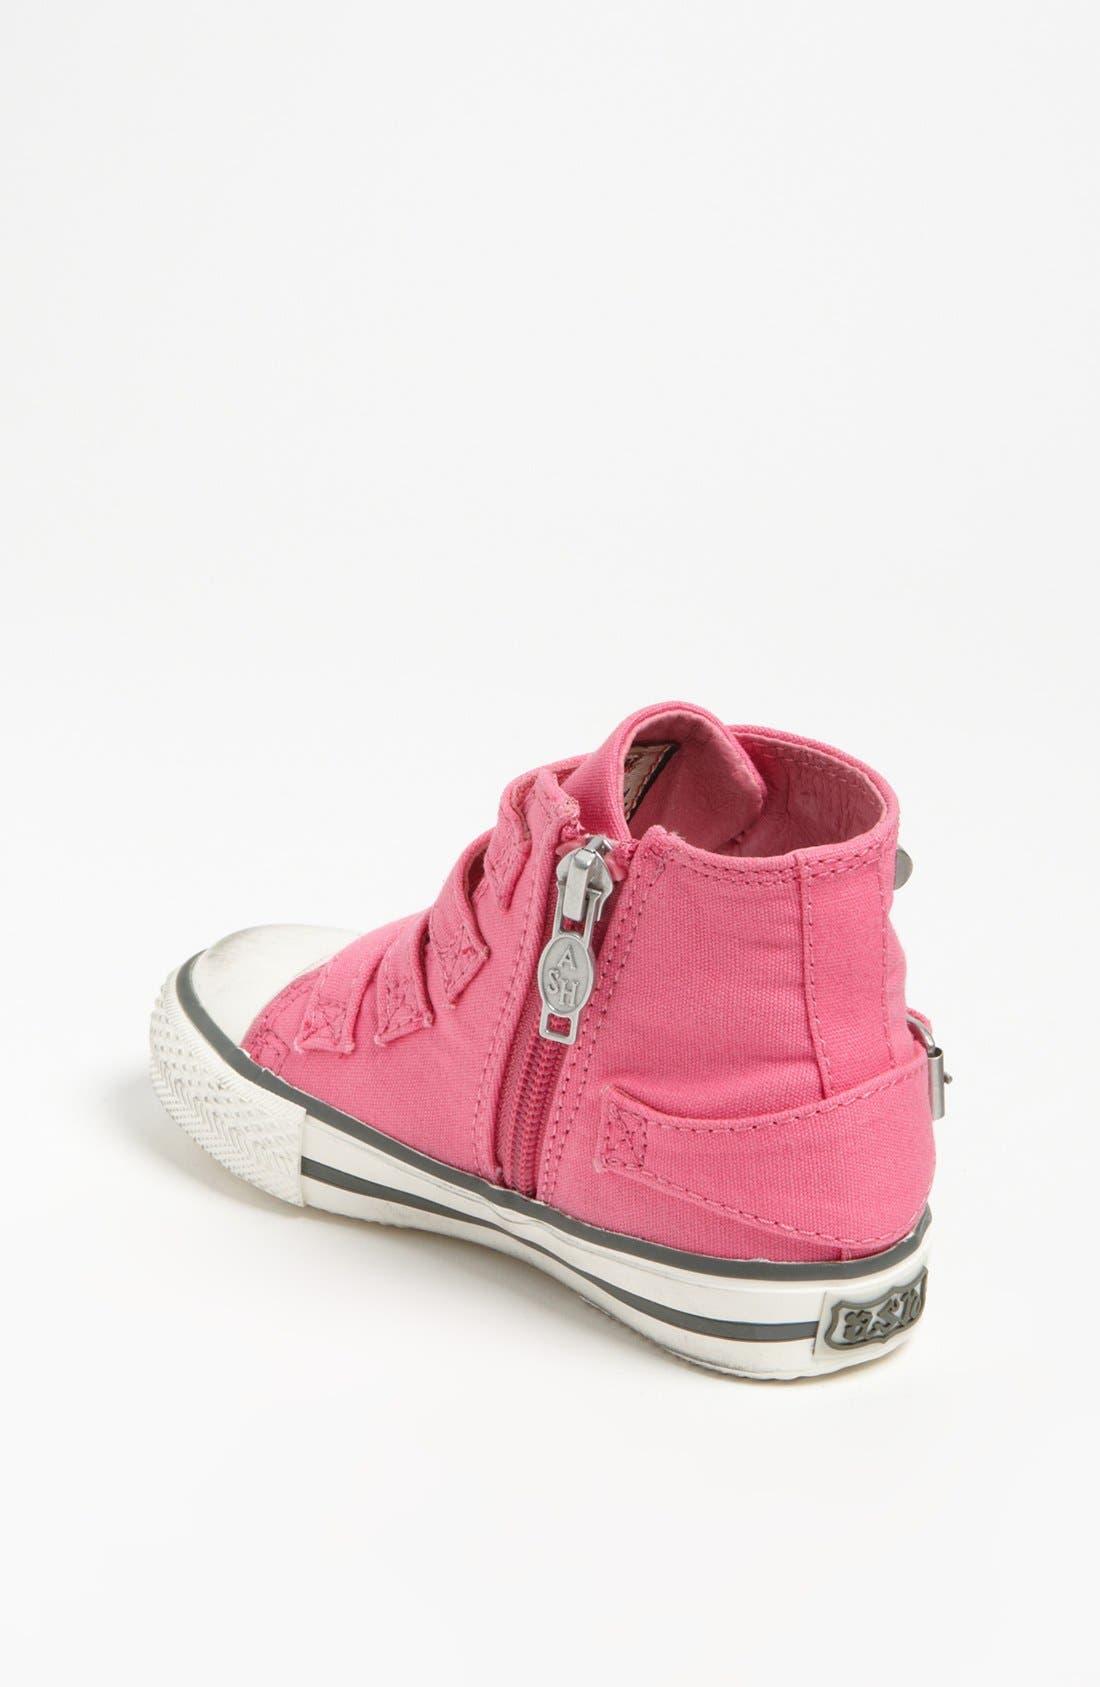 Alternate Image 2  - Ash 'Flip' High Top Sneaker (Toddler, Little Kid & Big Kid)